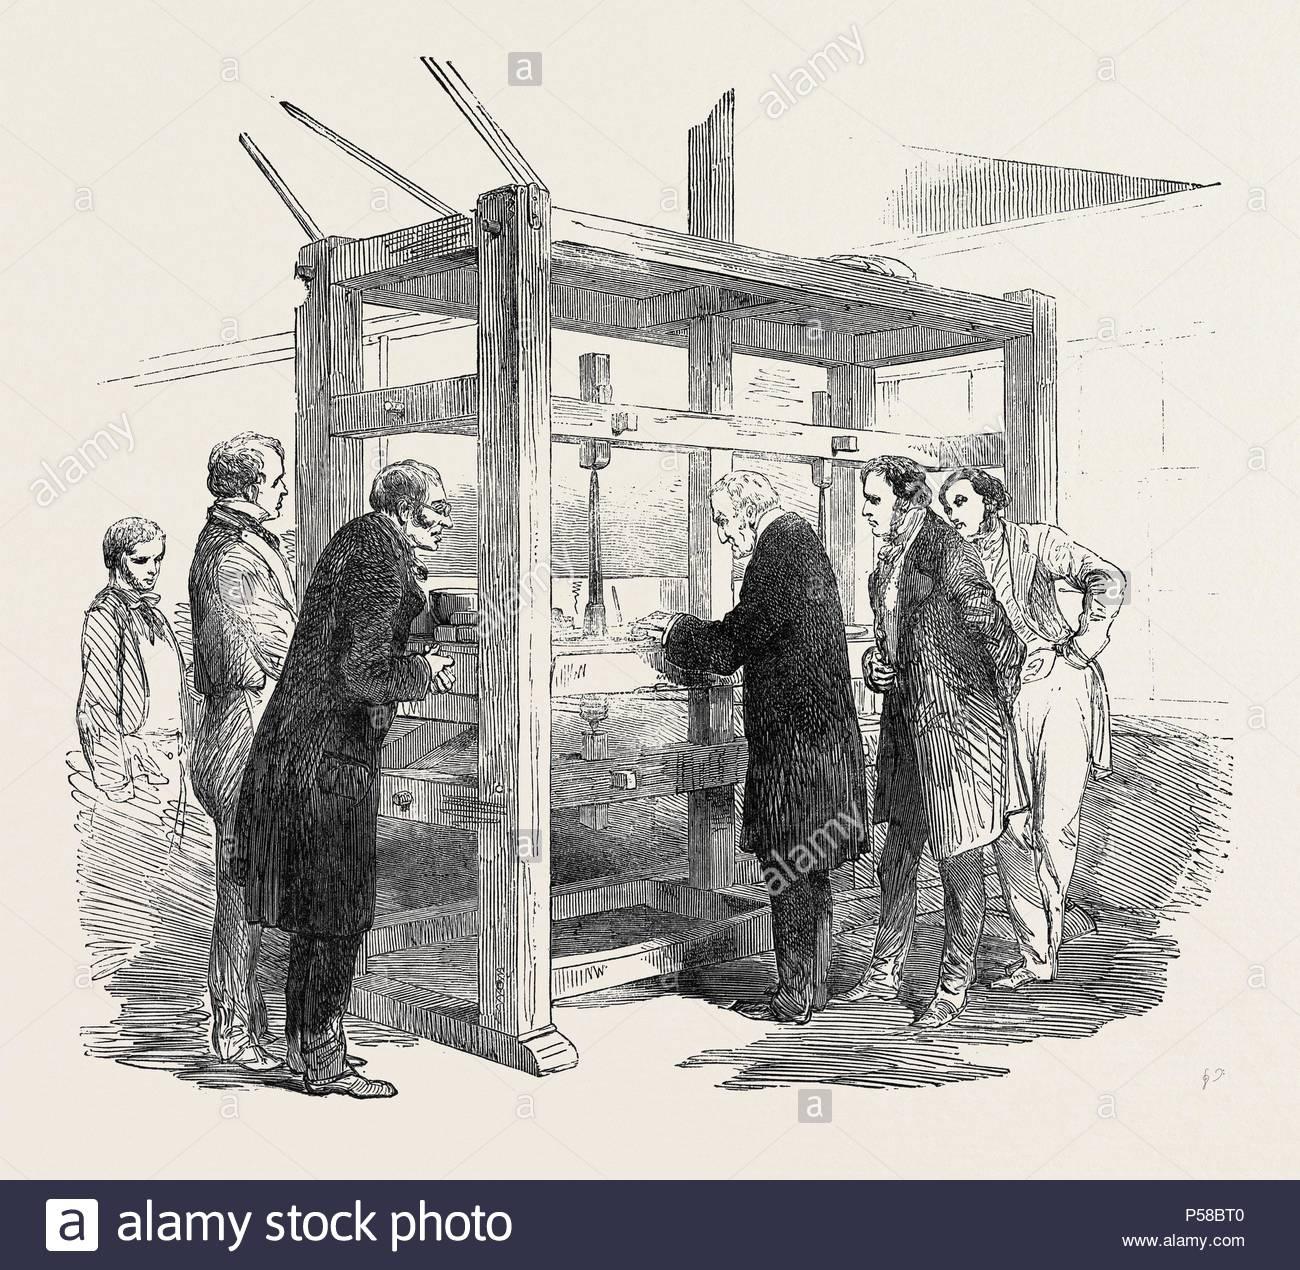 RE-CUTTING THE KOH-I-NOOR DIAMOND, 1852. - Stock Image